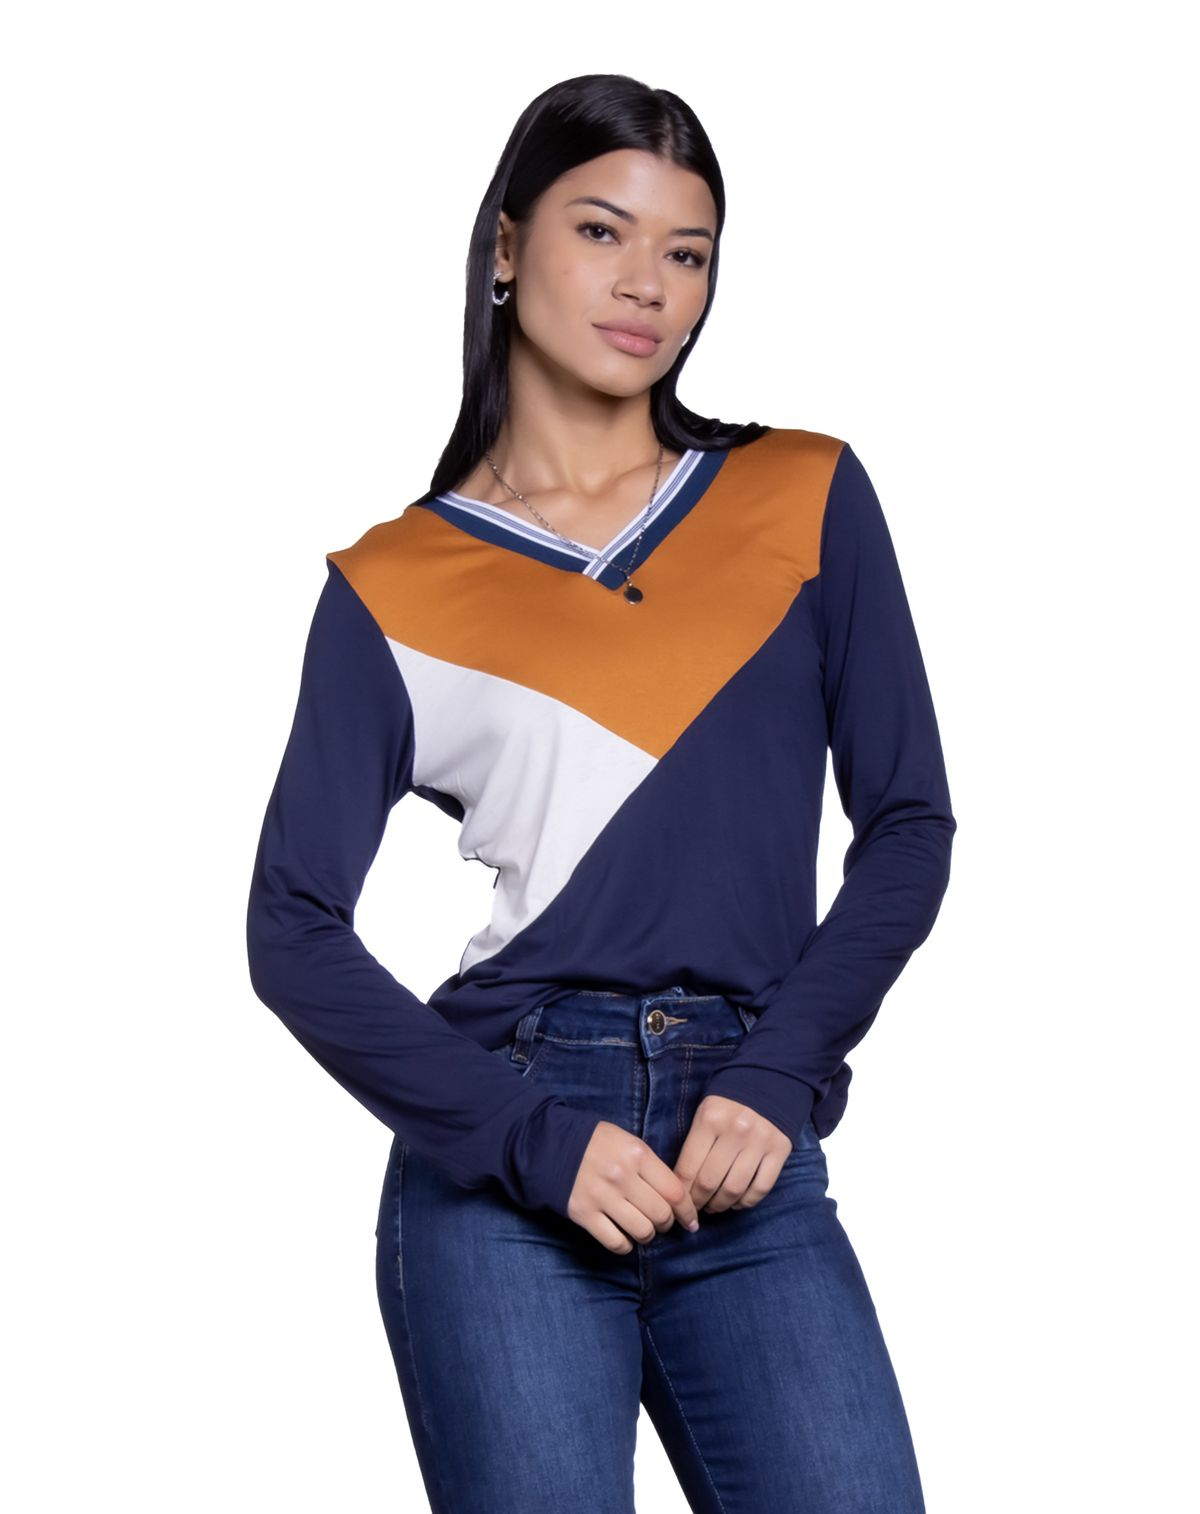 579447004-blusa-manga-longa-feminina-recortes-decote-v-marinho-gg-ae5